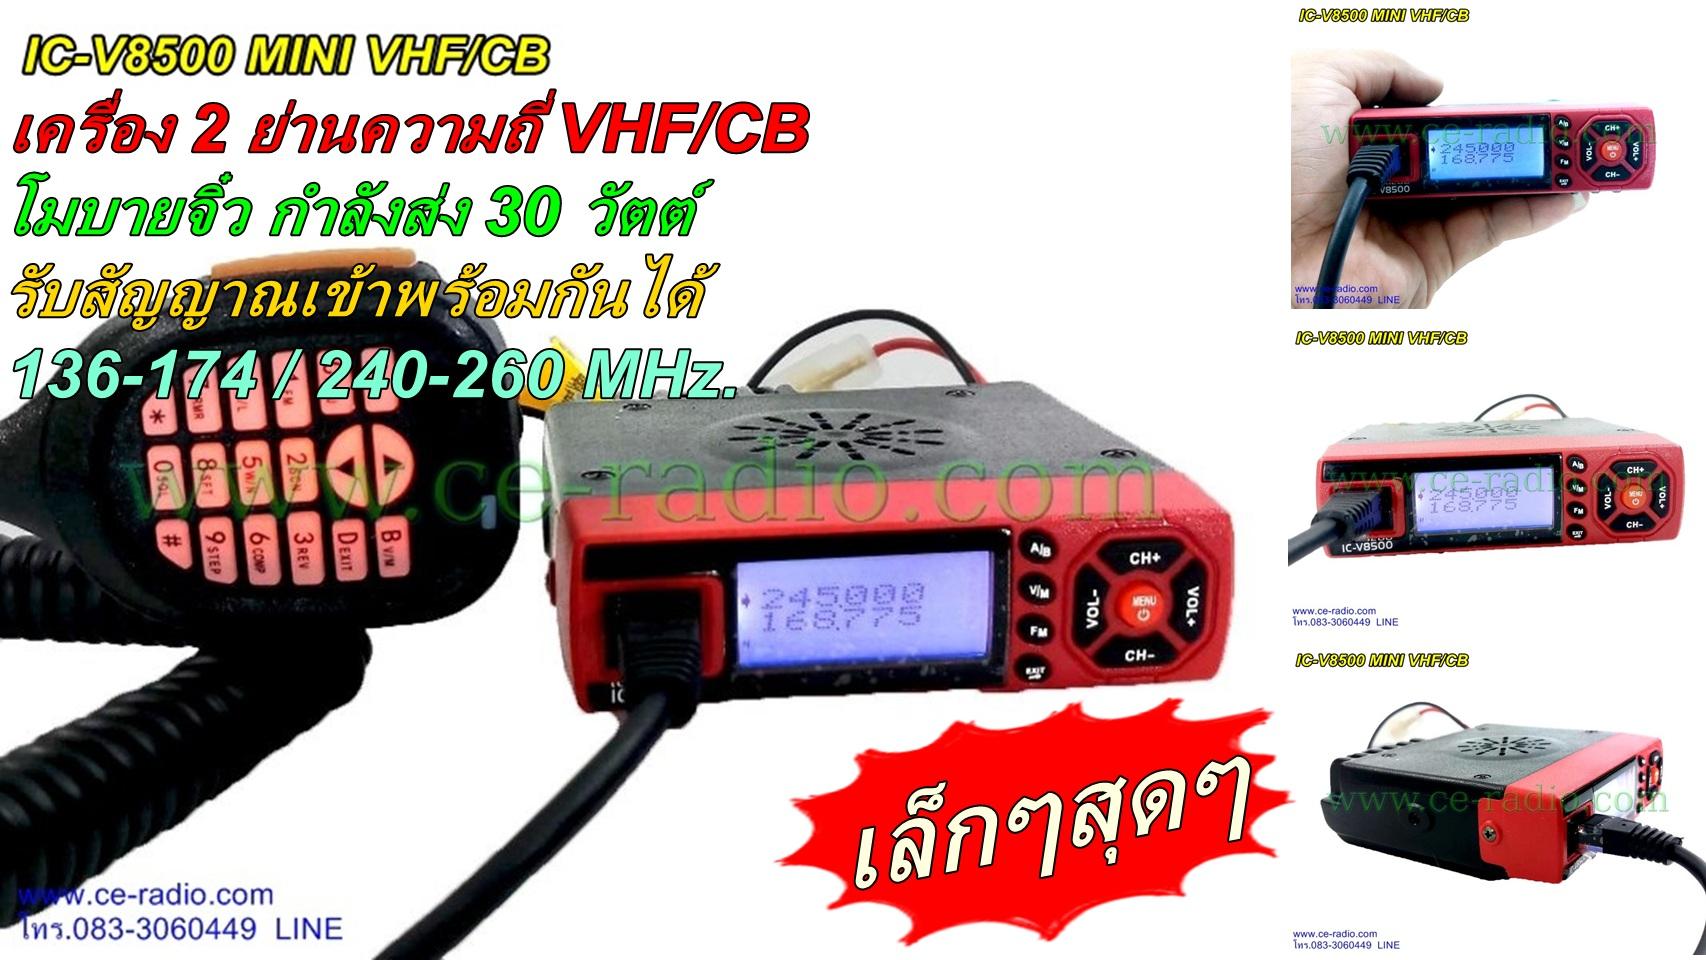 IC-V8500 MINI หน้าแดง วิทยุโมบายขนาดเล็ก 2 ย่าน VHF/CB 25W.